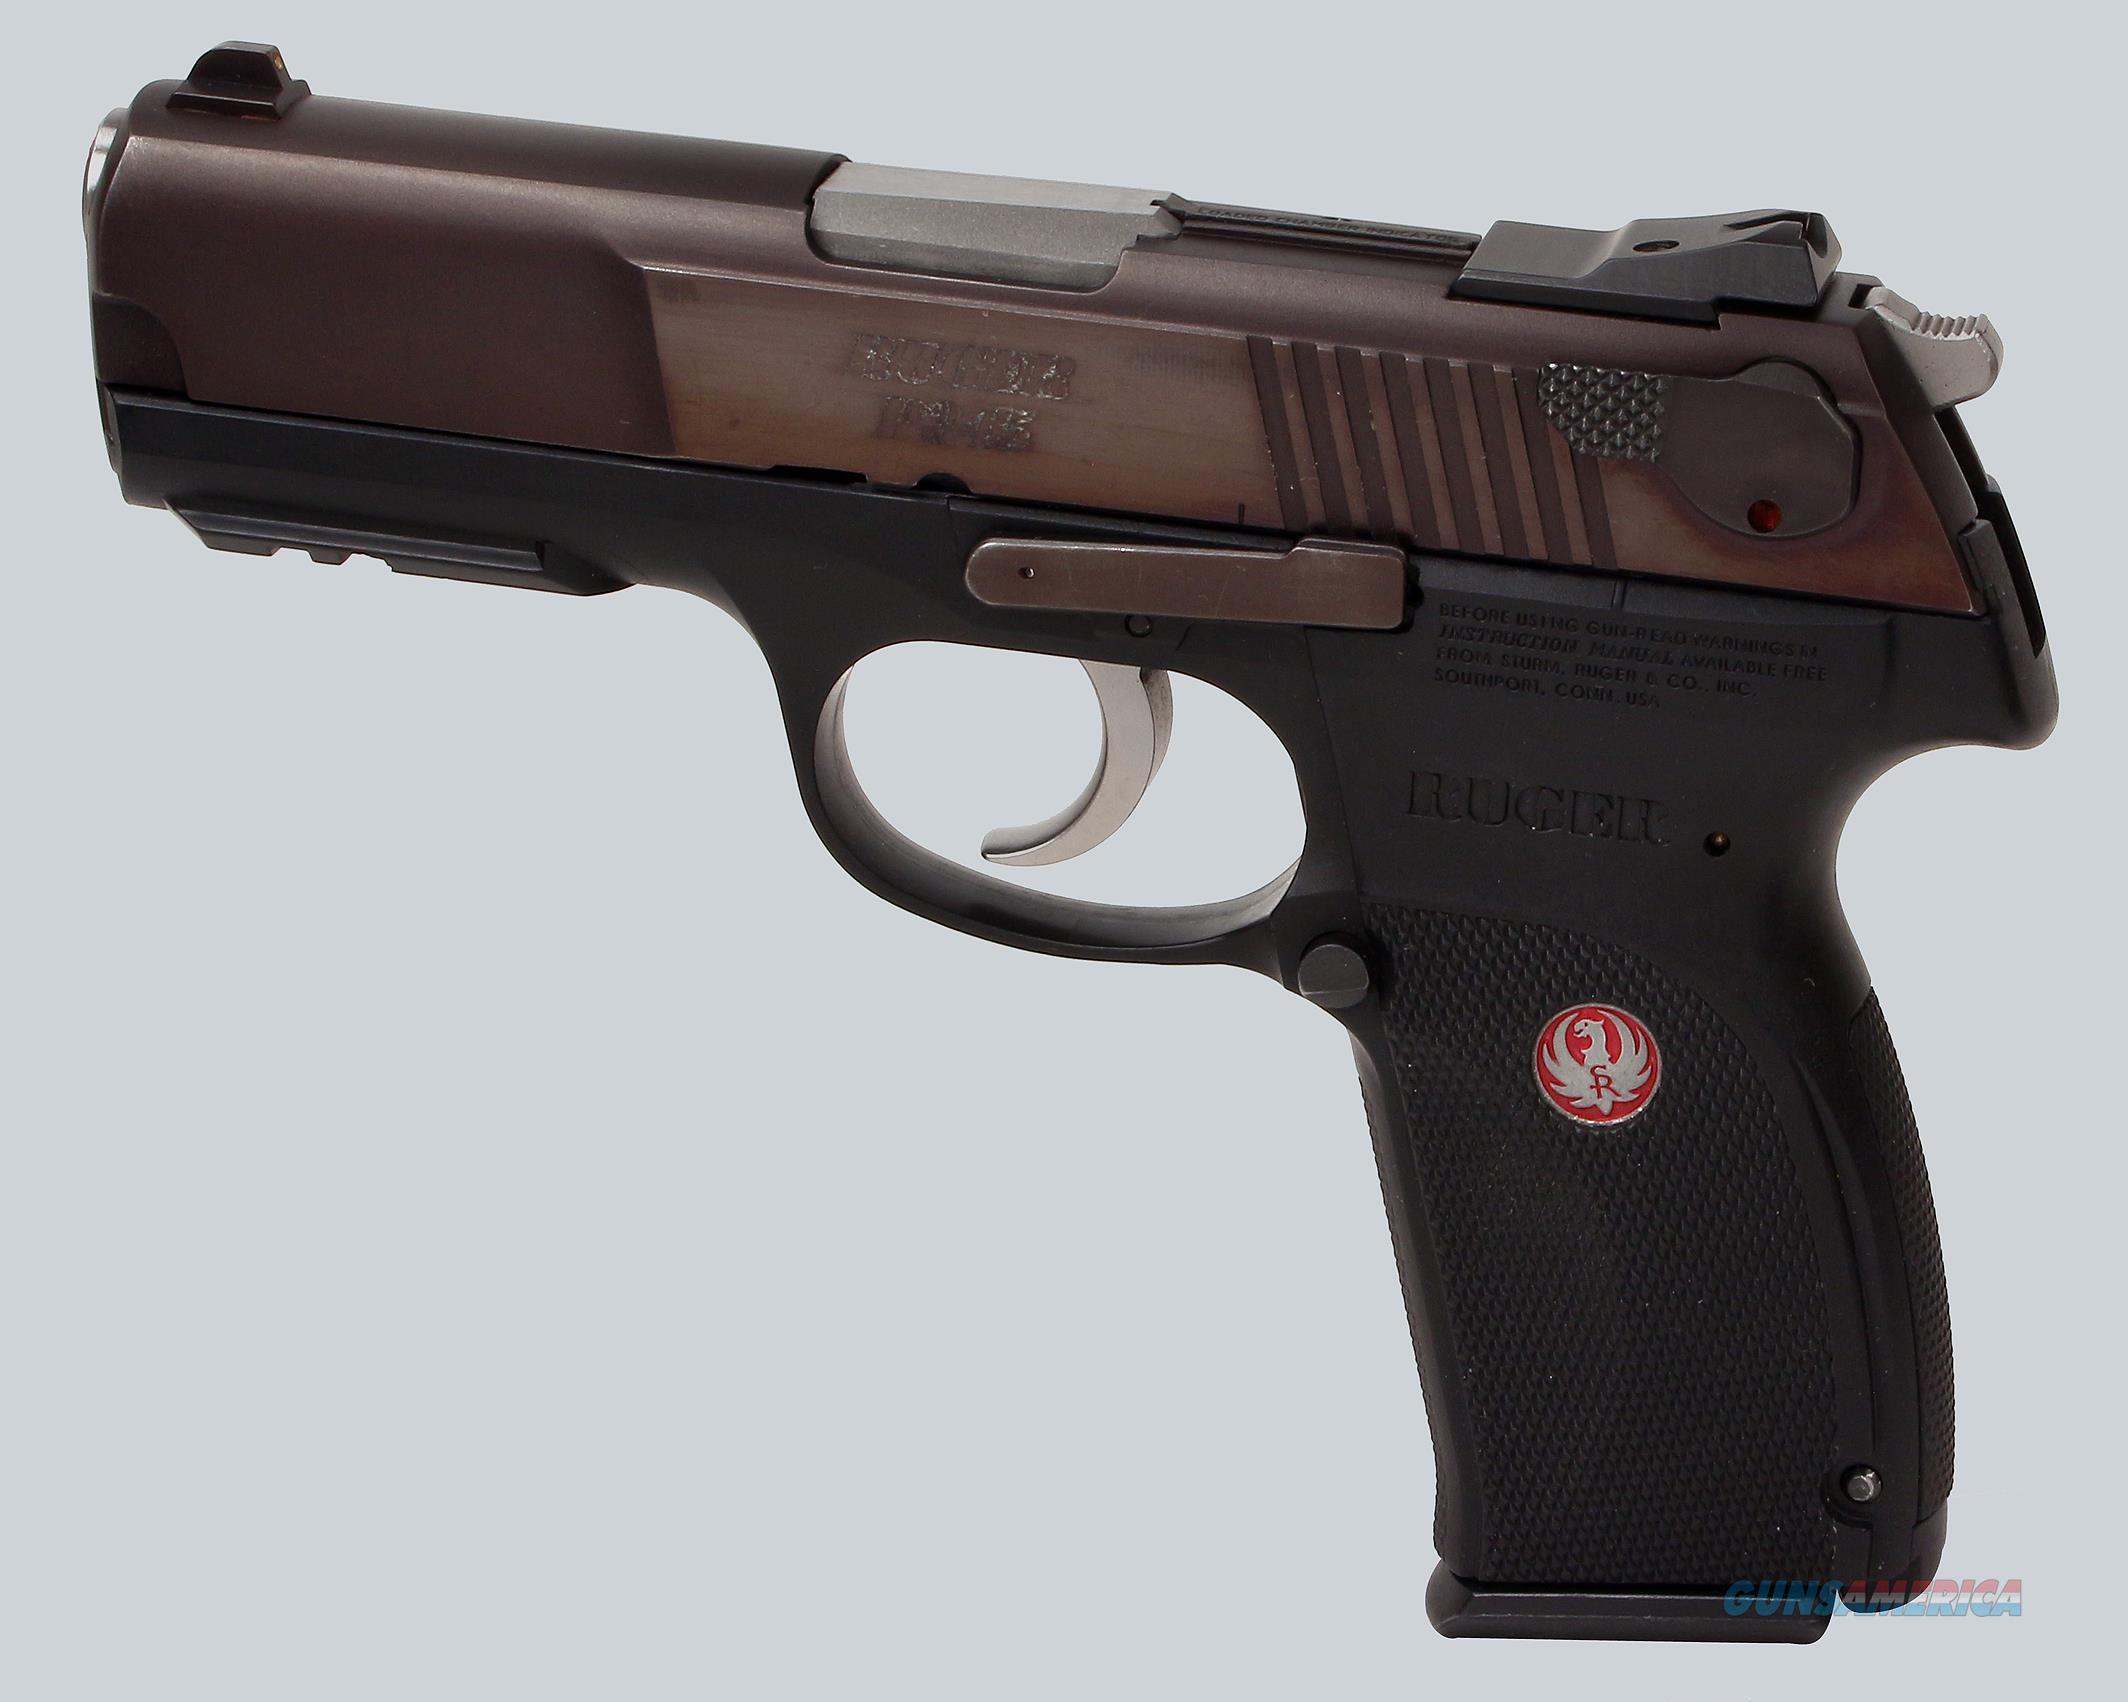 Ruger 45acp Model P345 Pistol  Guns > Pistols > Sig - Sauer/Sigarms Pistols > P320